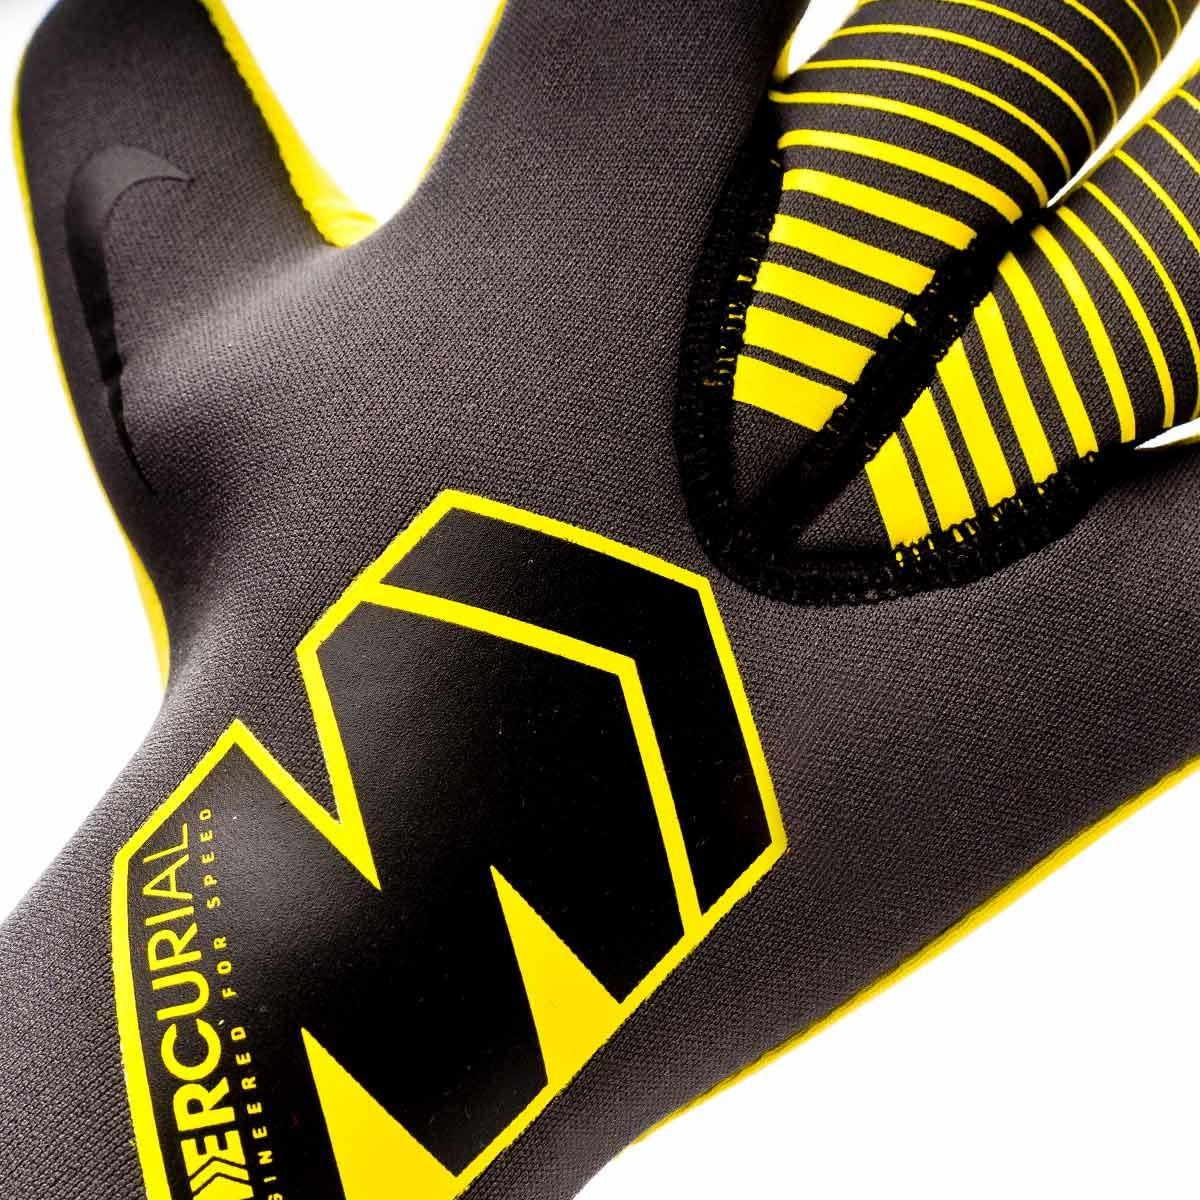 Observar sátira No de moda  Glove Nike Mercurial Touch Victory Anthracite-Black-Optical yellow -  Football store Fútbol Emotion